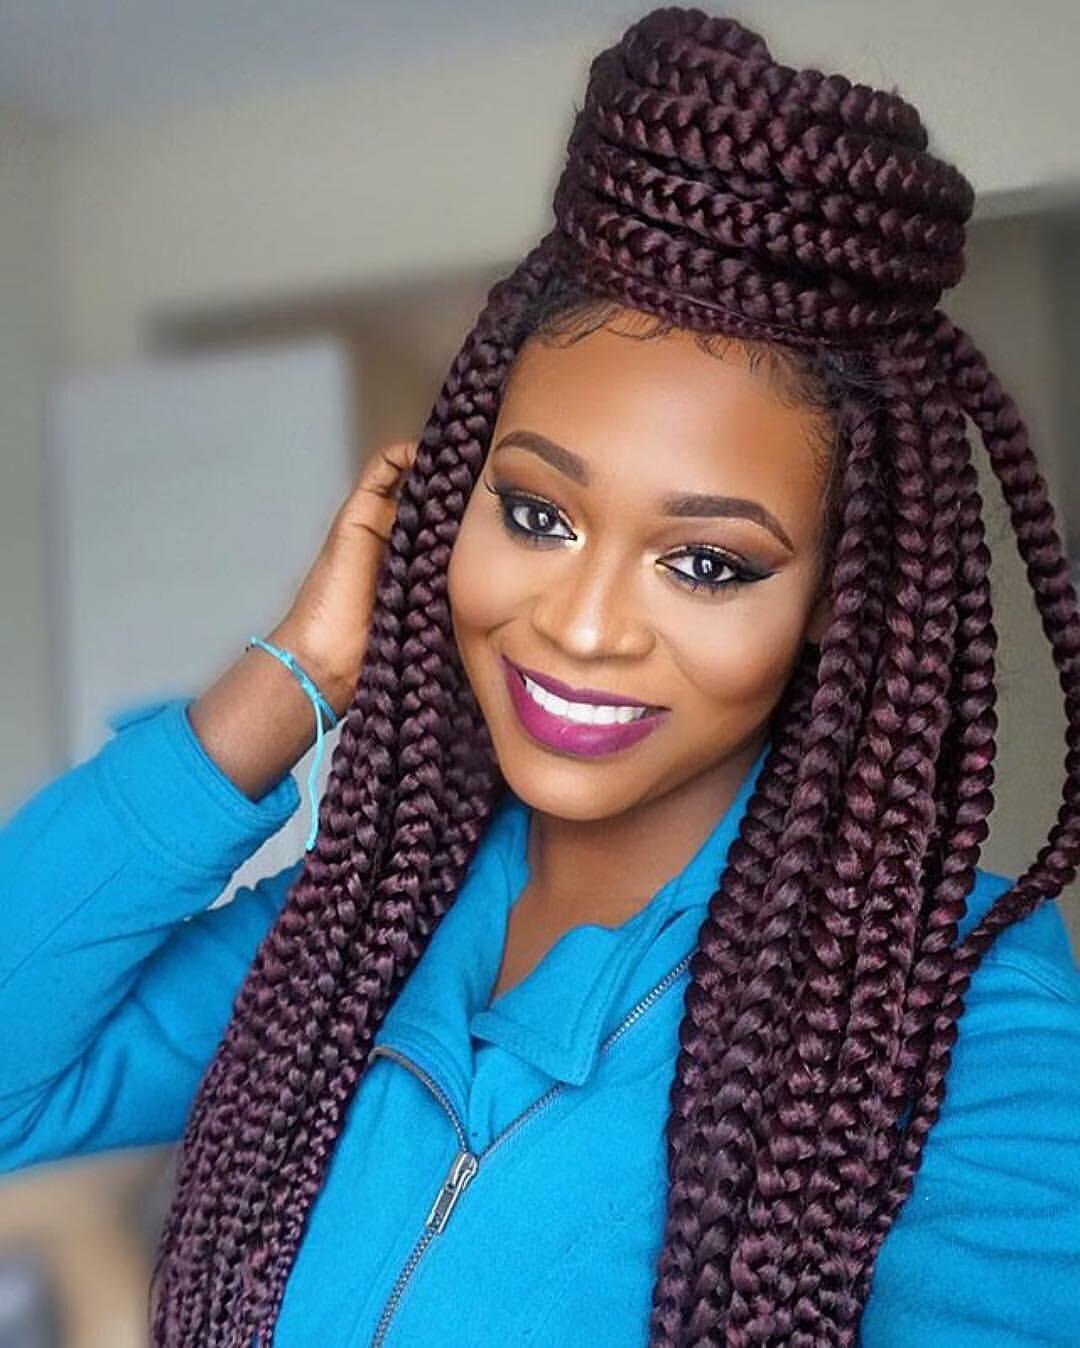 Single Braids Hairstyles: New Summer Trend 2017